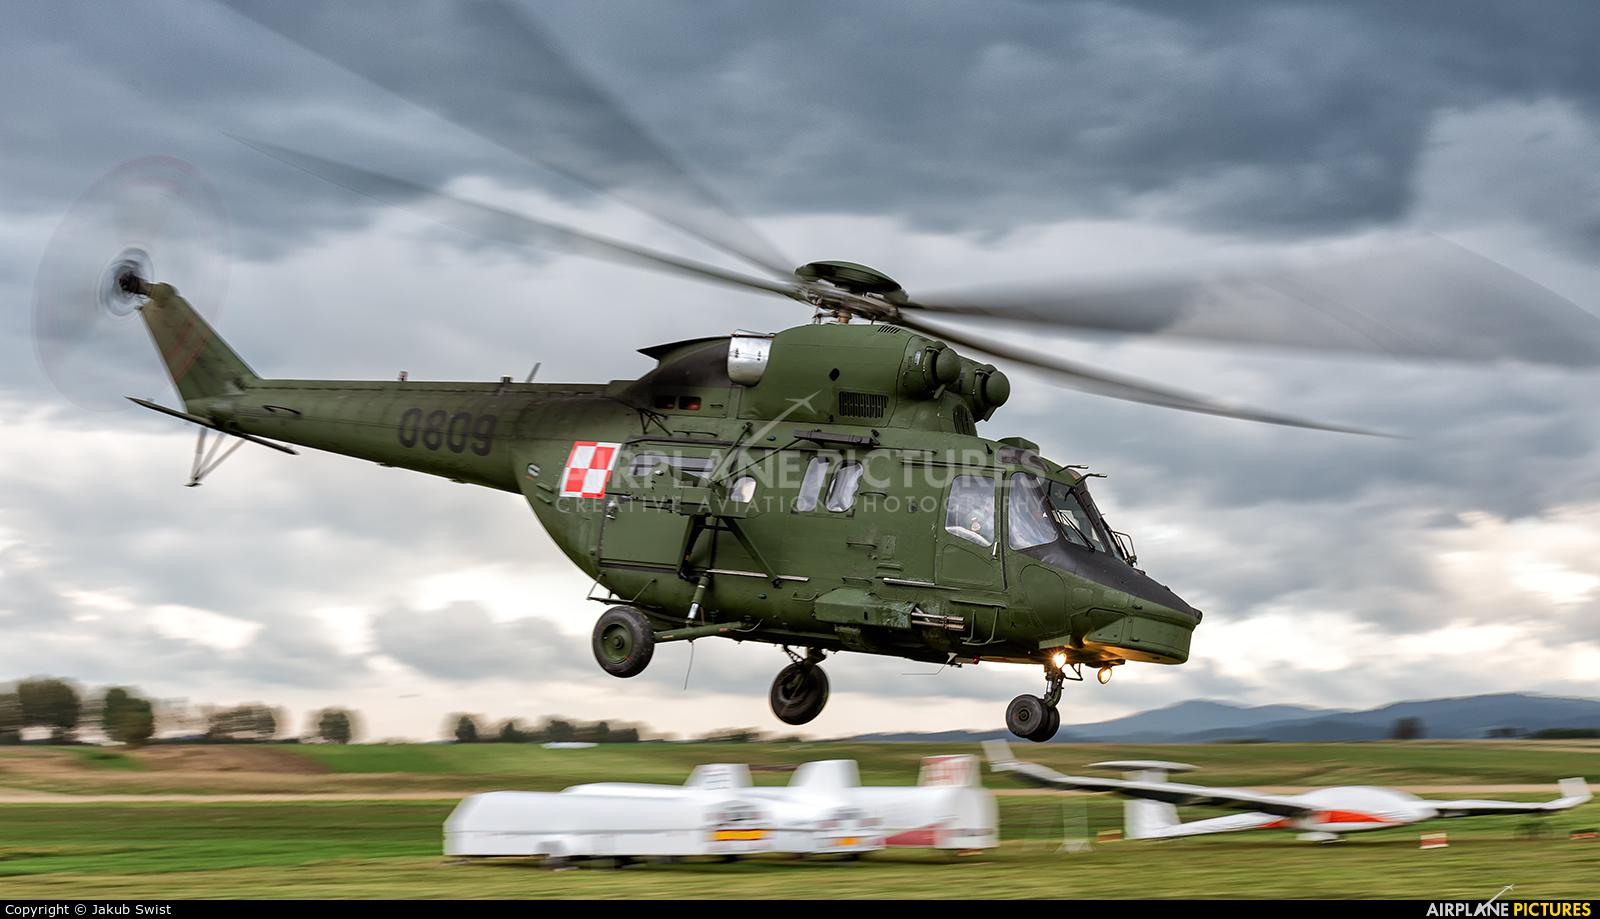 Poland - Air Force 0809 aircraft at Nowy Targ Airport